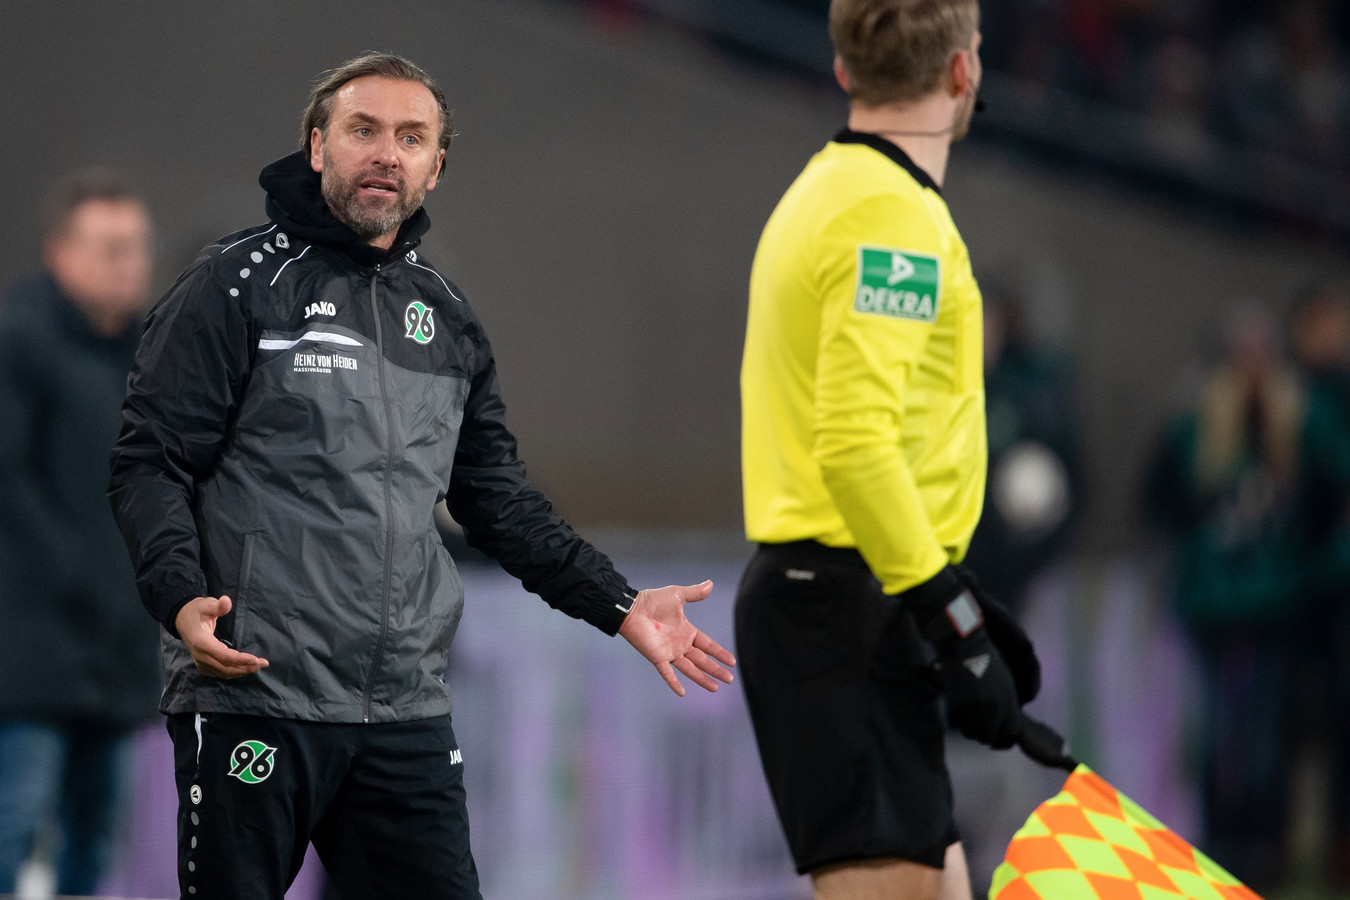 Thomas Doll, vorig seizoen de coach van het gedegradeerde Hannover 96